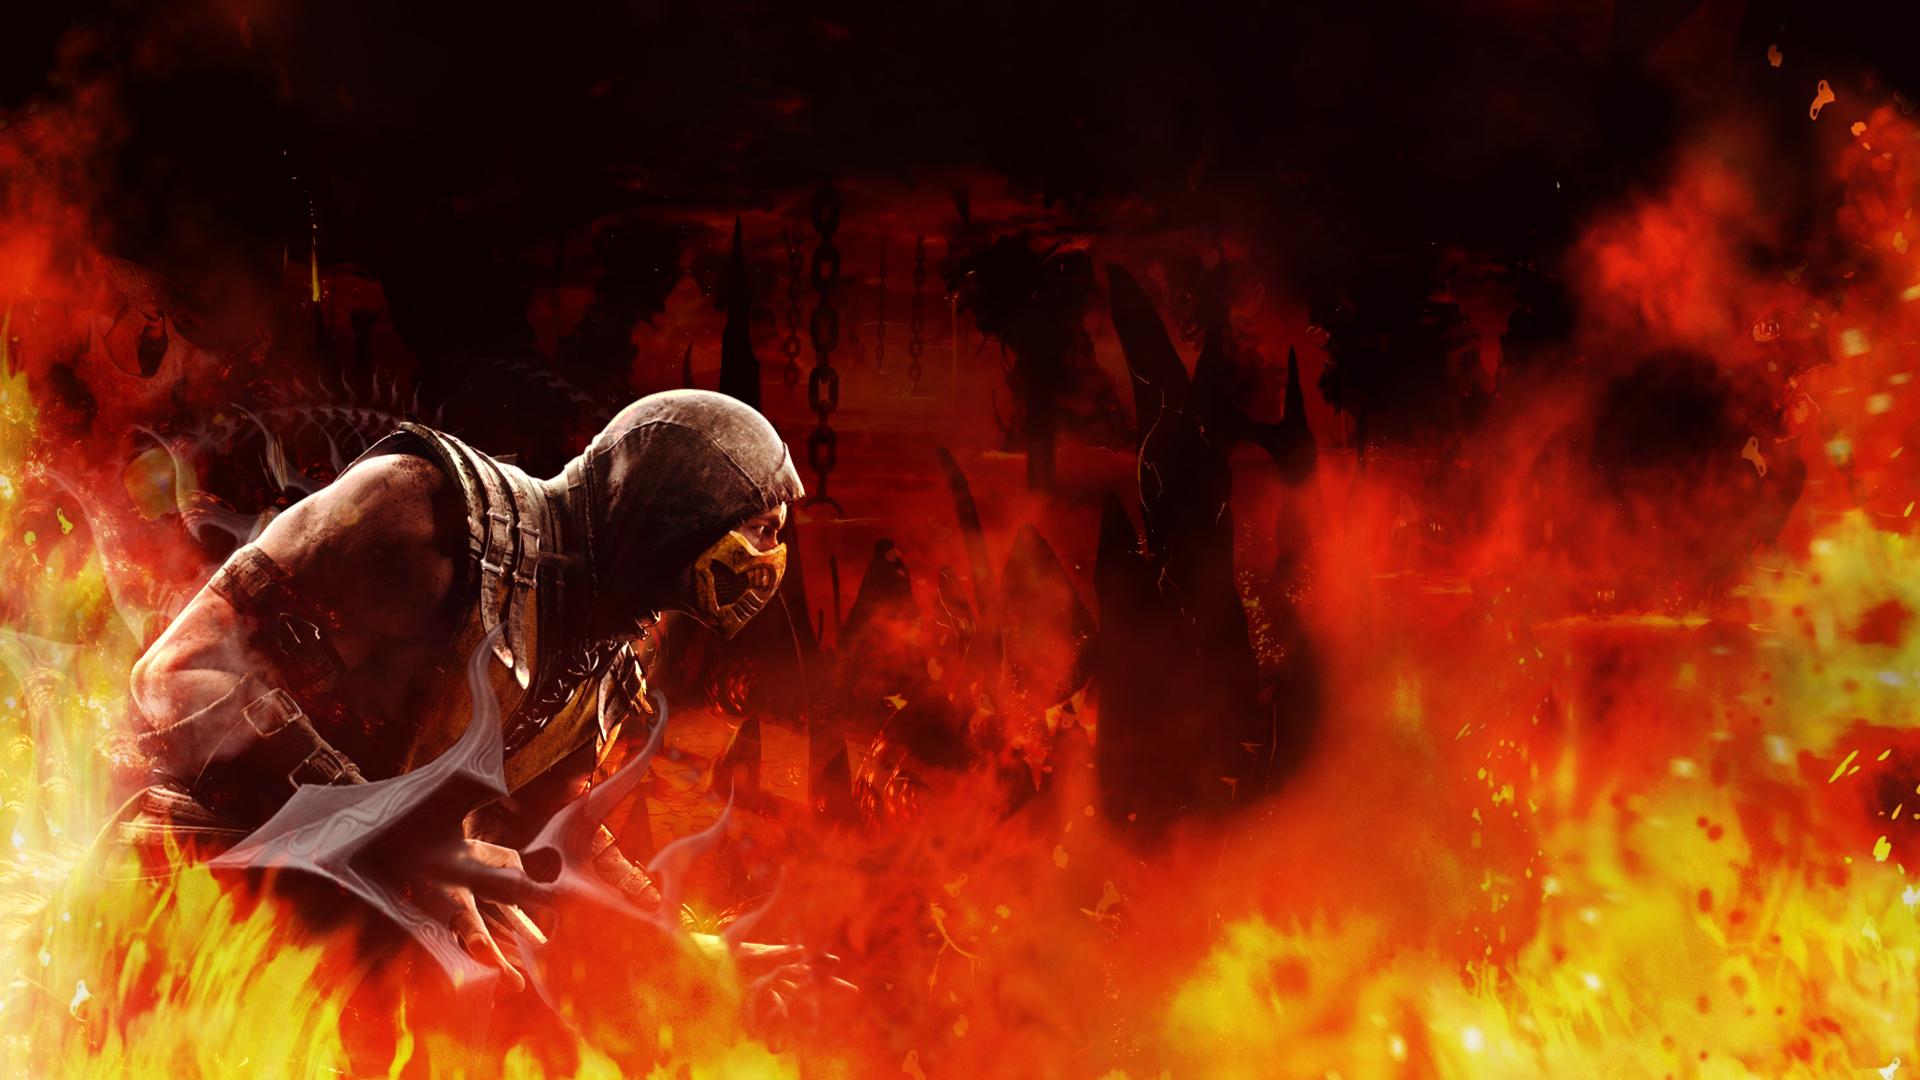 Mortal Kombat X Scorpion Wallpaper 1920 1080 By Kothanos